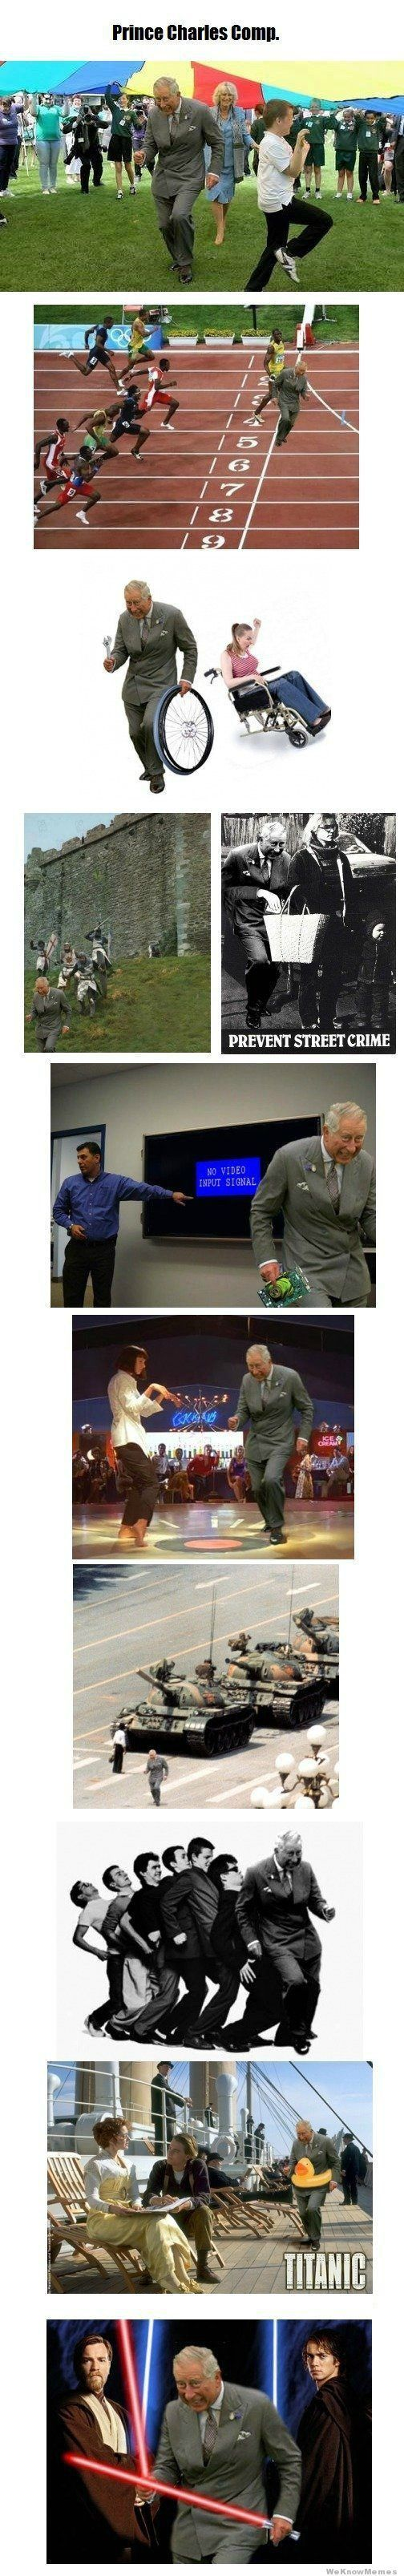 Prince Charles Dancing Meme Comp